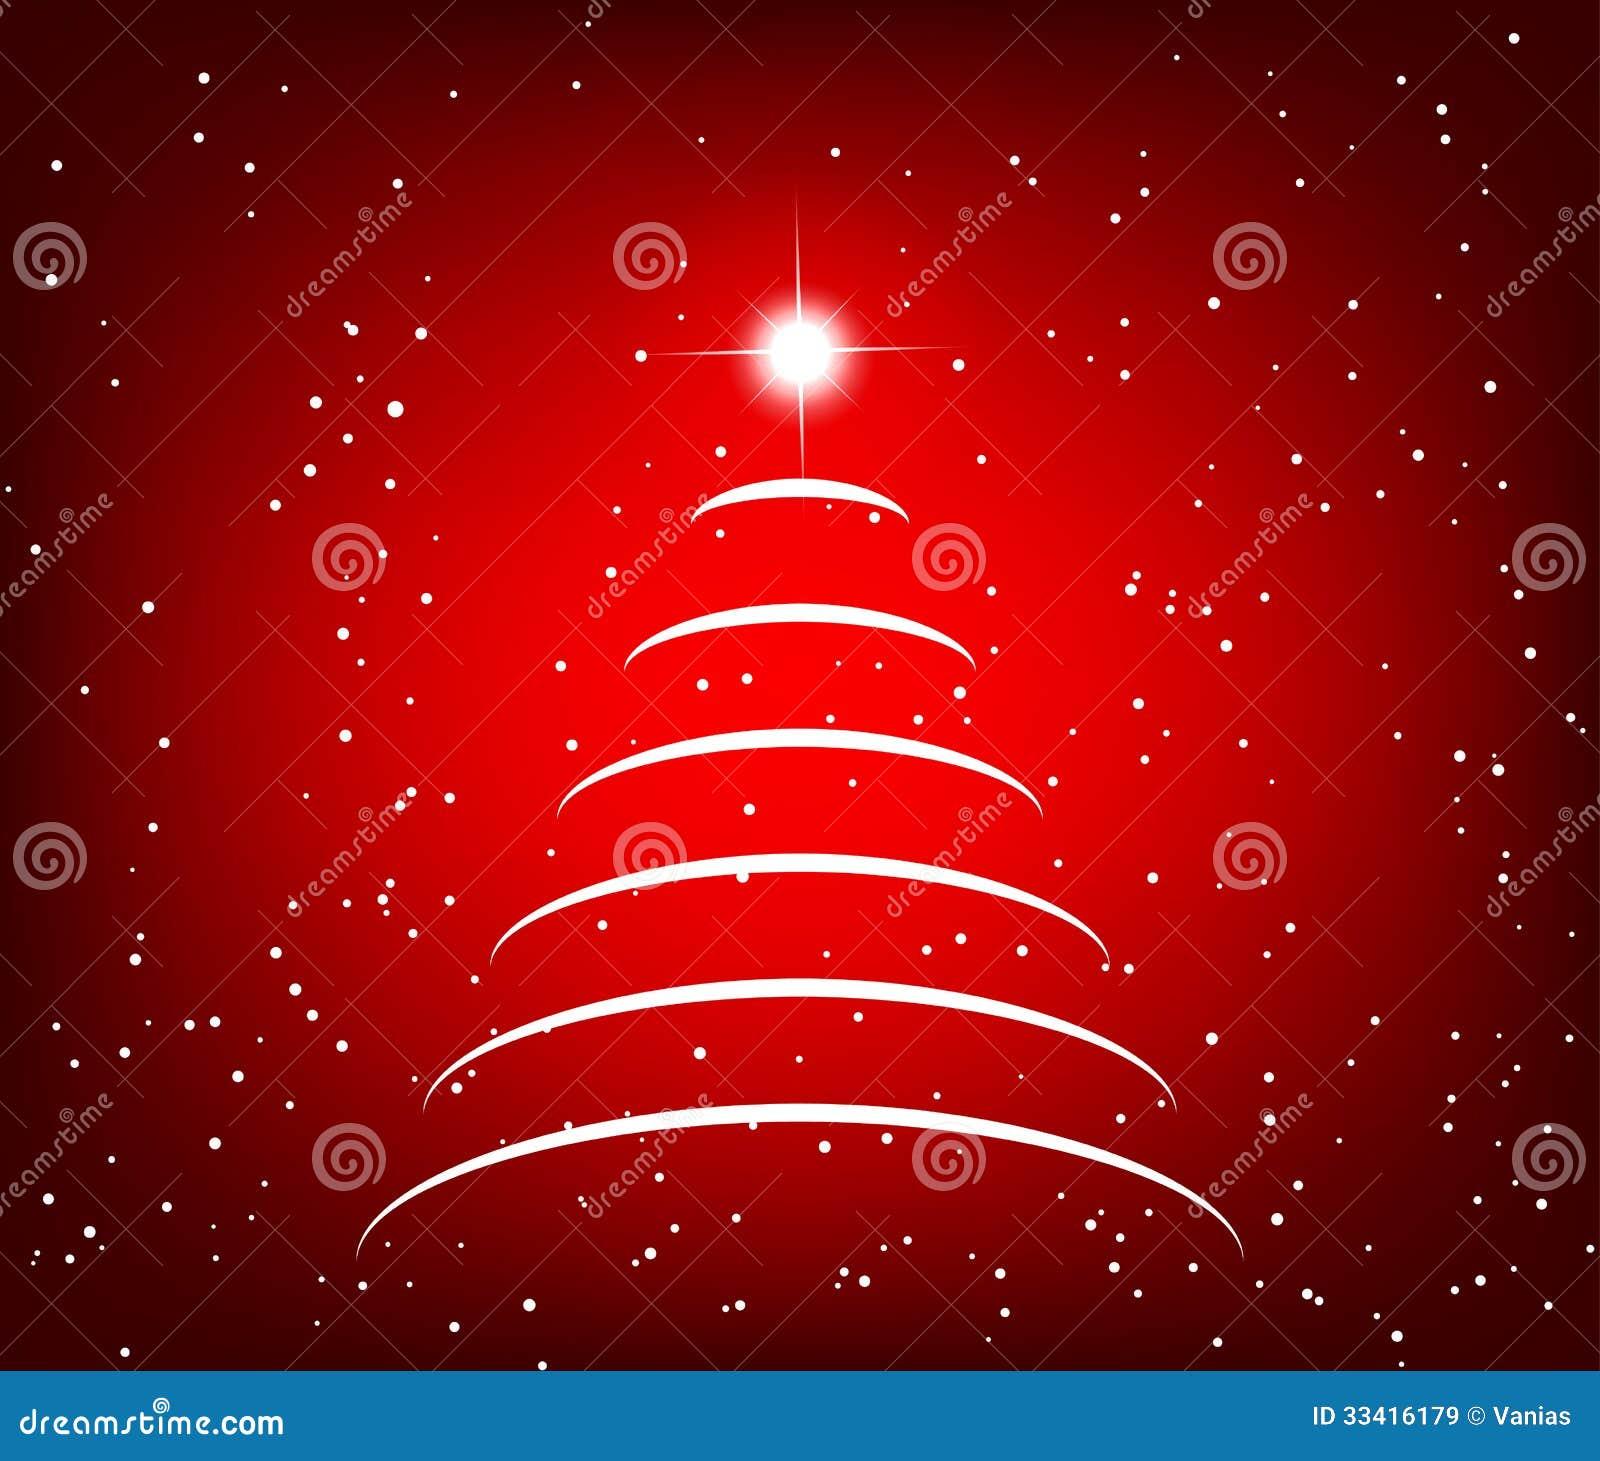 christmas tree background stock vector illustration of snowflake 33416179